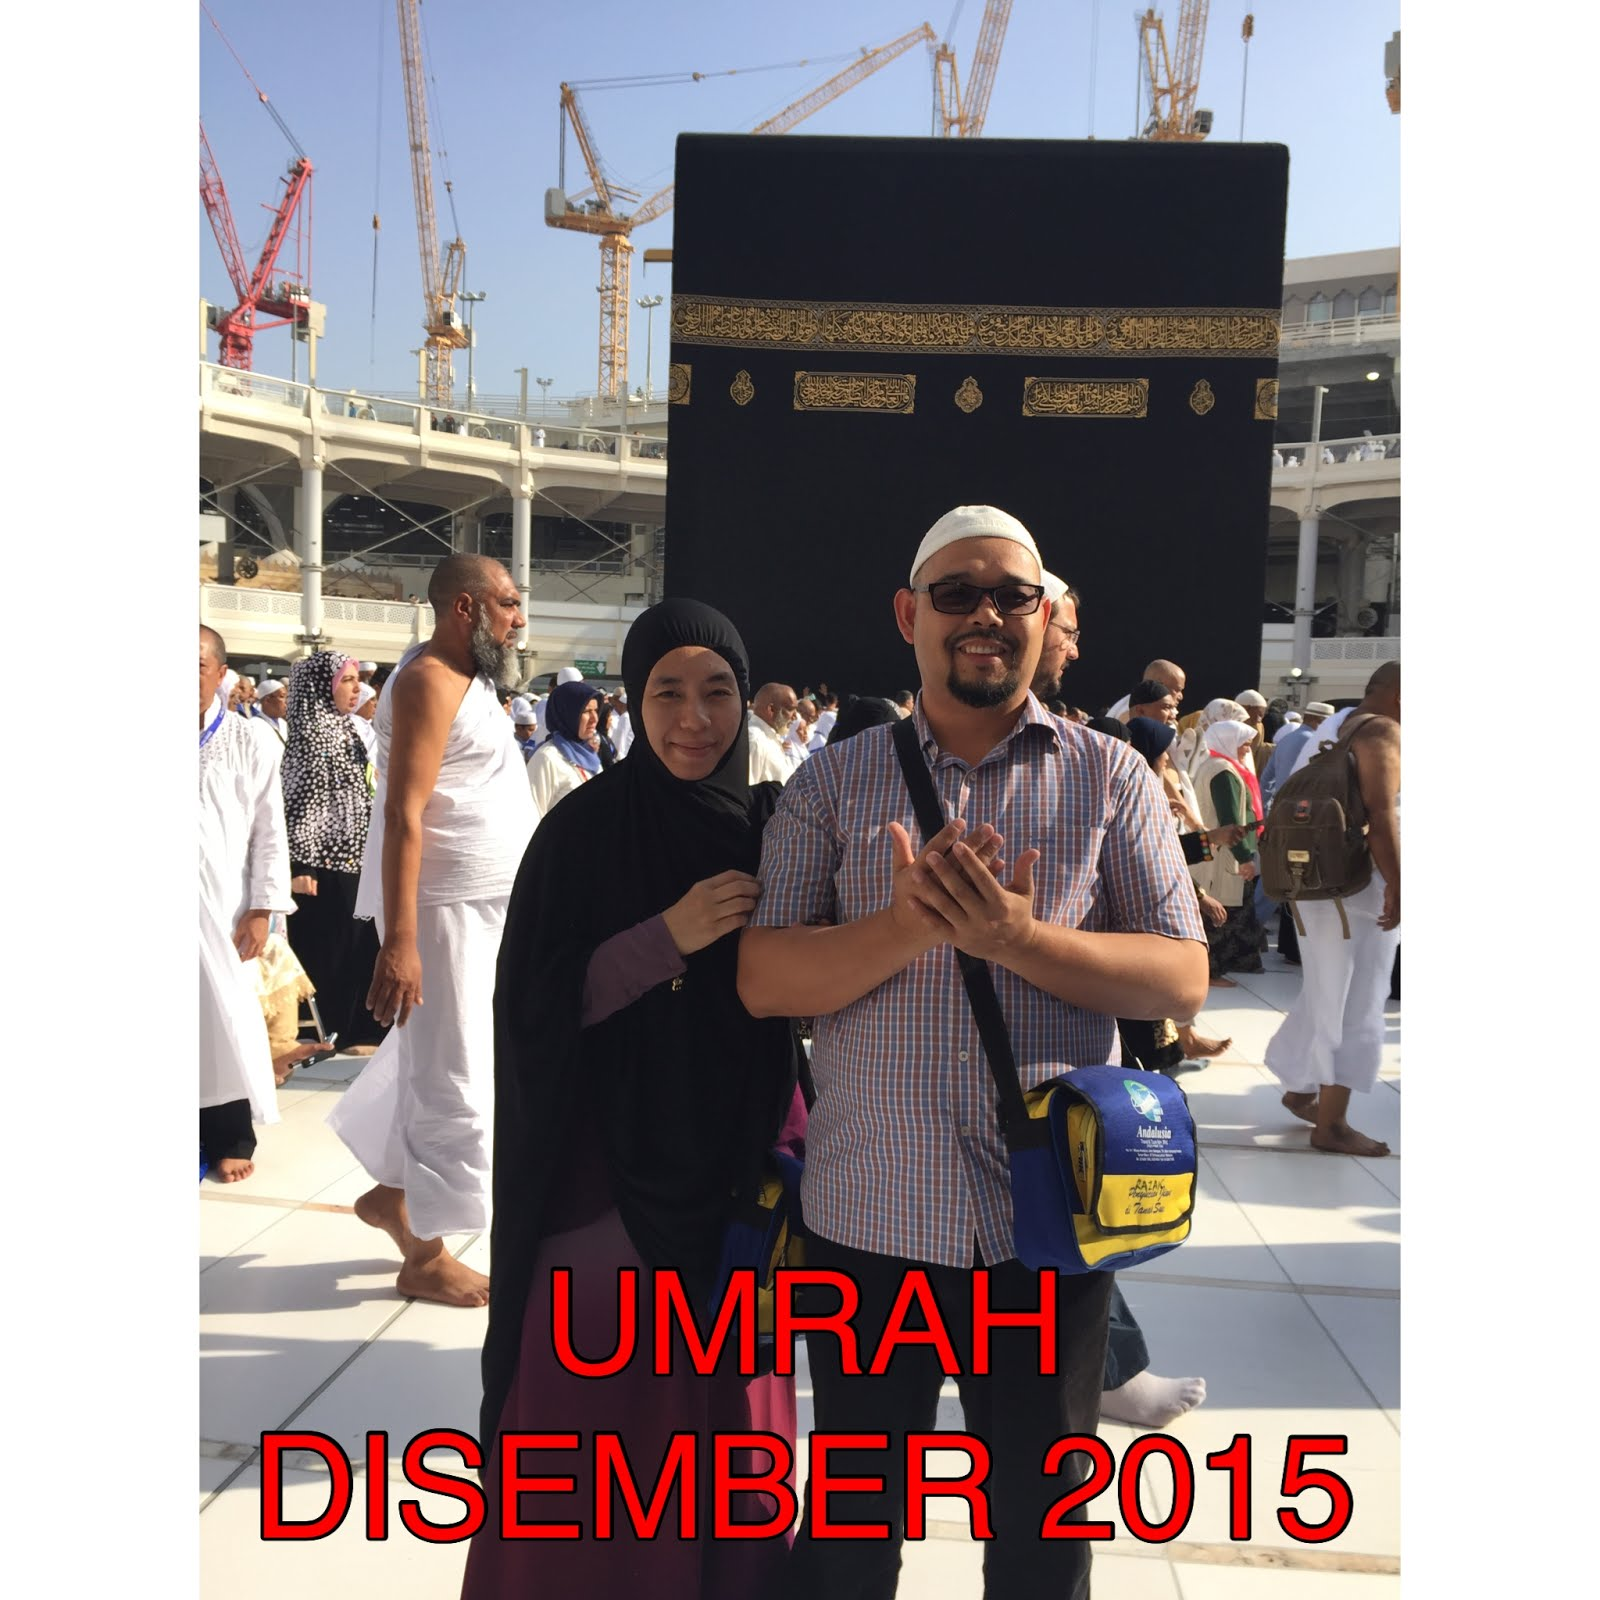 UMRAH DISEMBER 2015